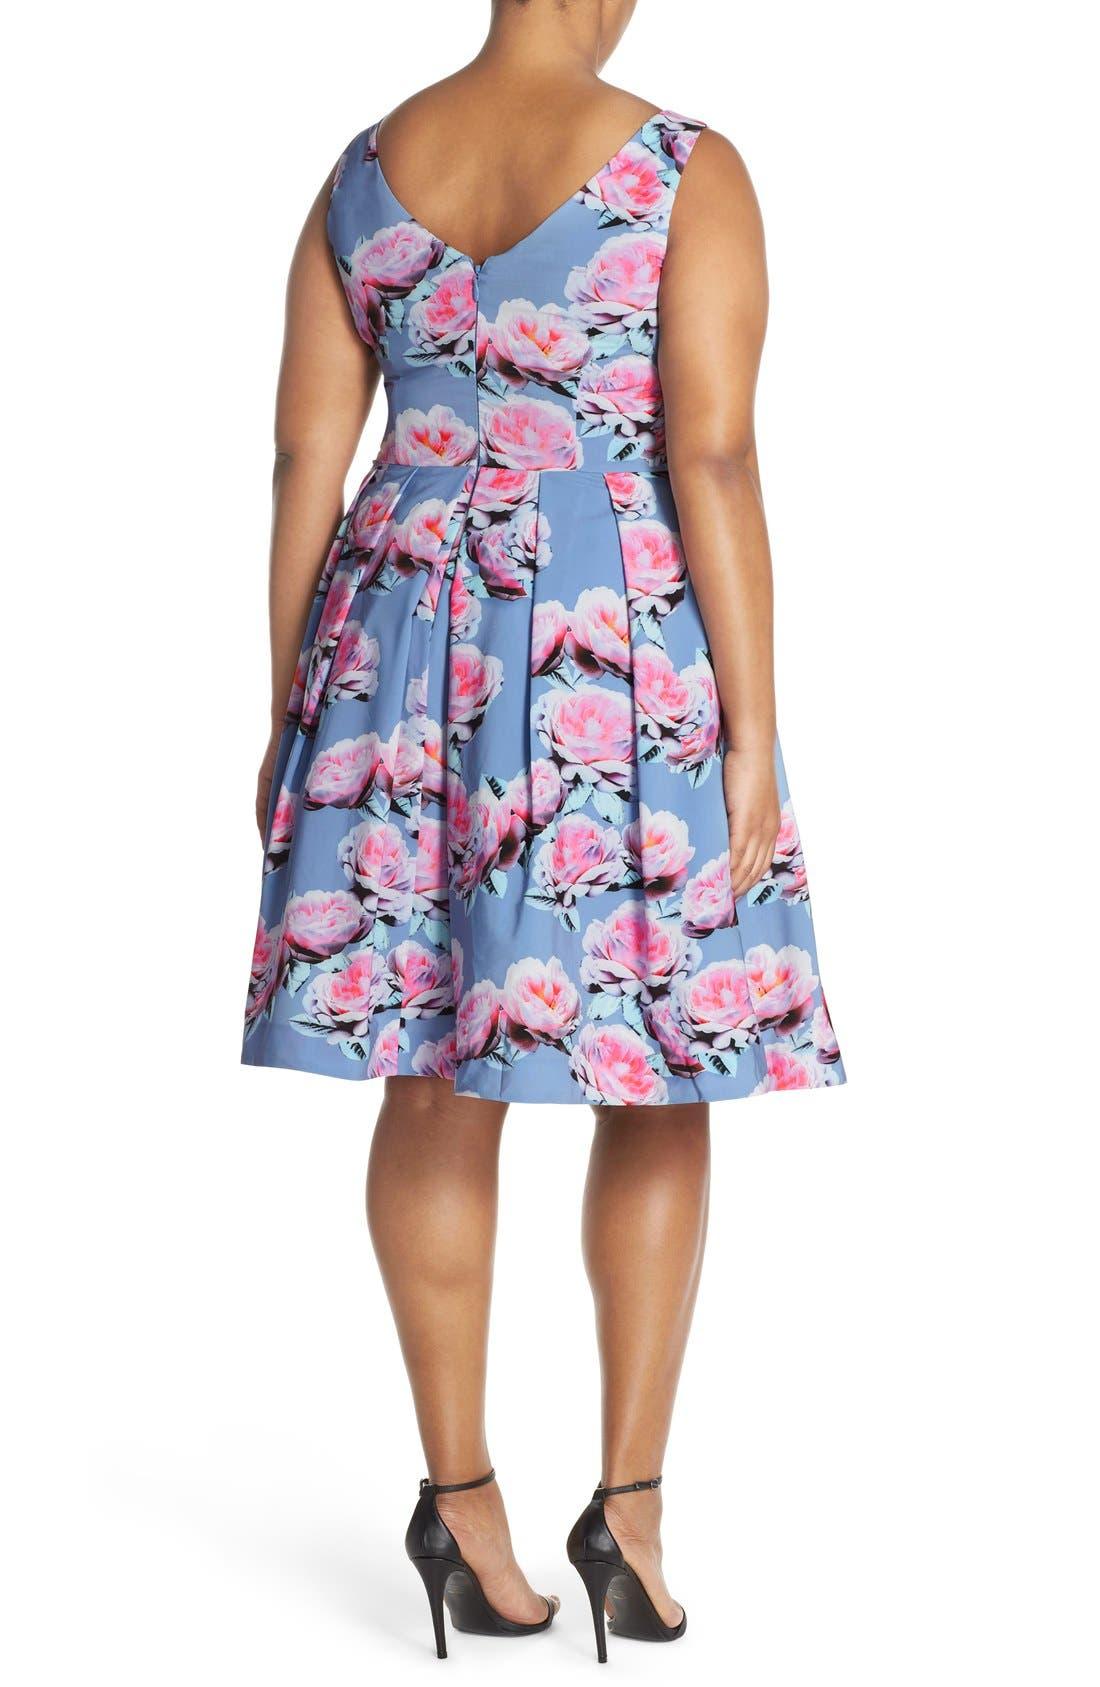 Alternate Image 3  - City Chic 'Powder Posey' Floral Print V-Neck Fit & Flare Dress (Plus Size)